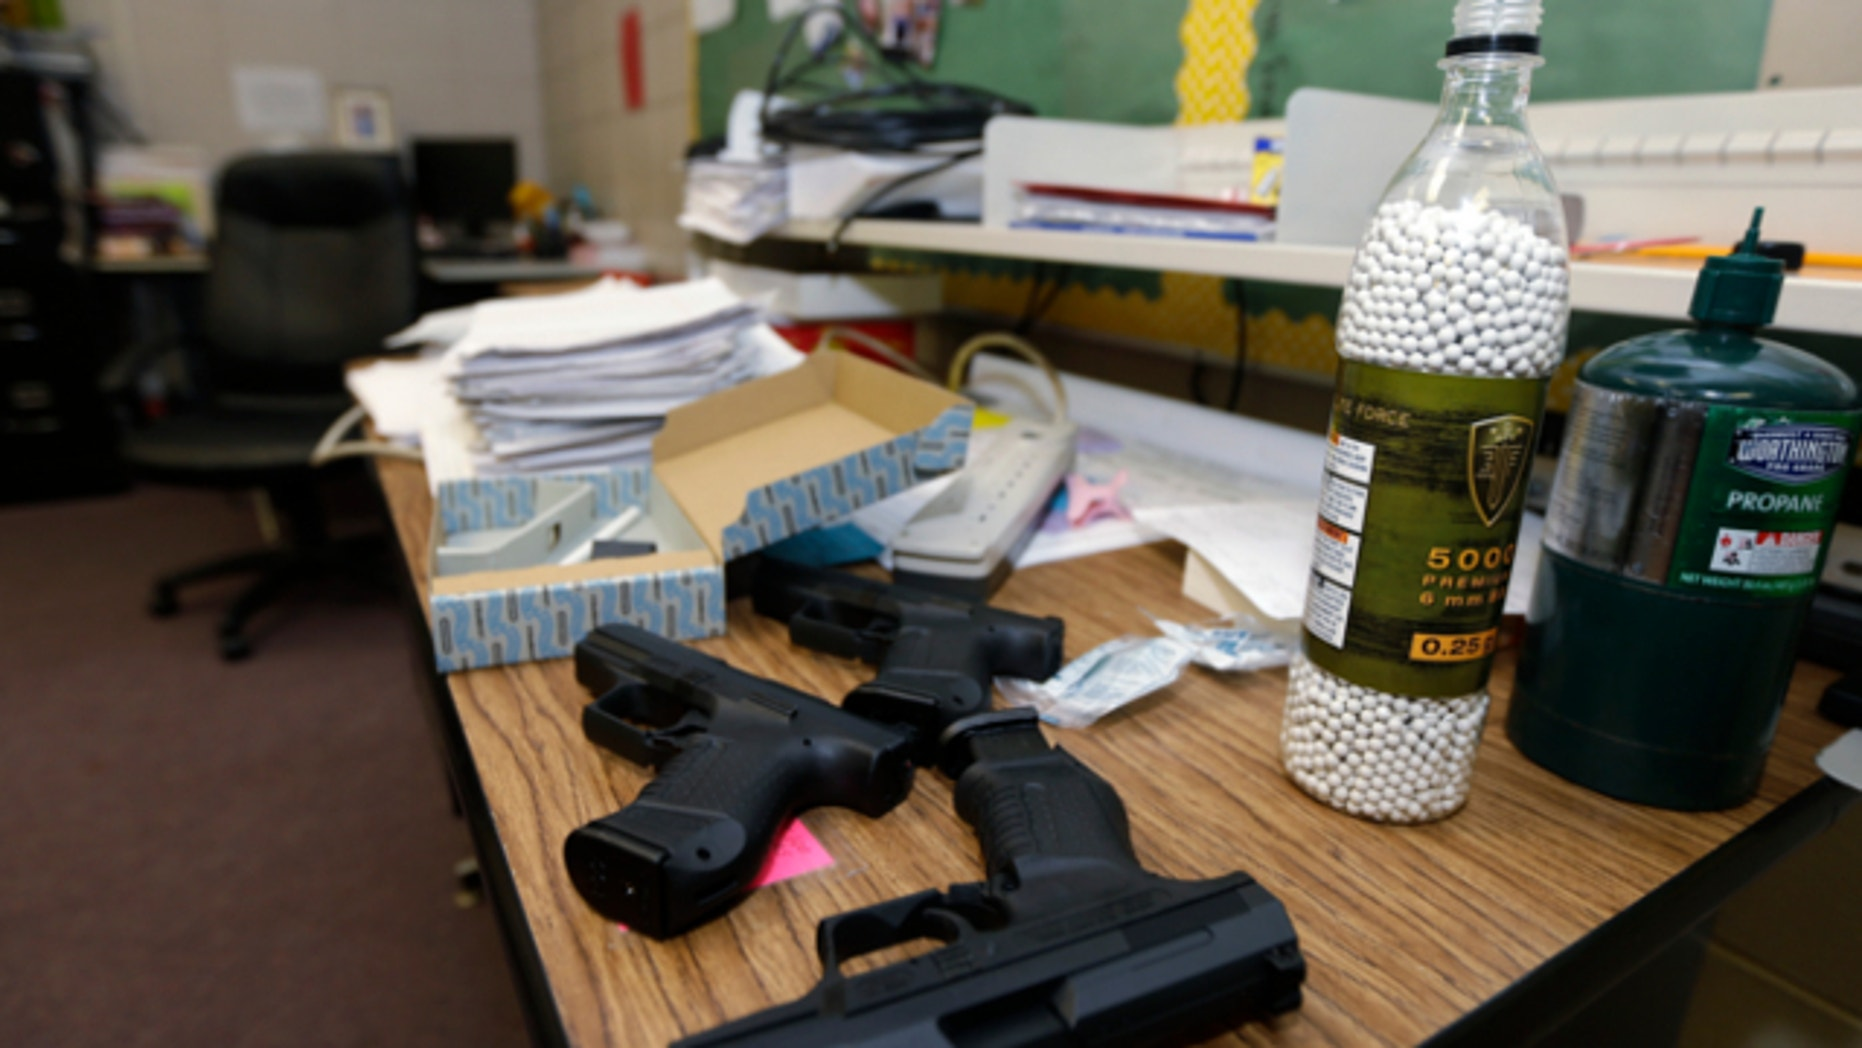 July 11, 2013: Practice air-powered handguns sit on a teacher's desk in a classroom at Clarksville High School in Clarksville, Ark.